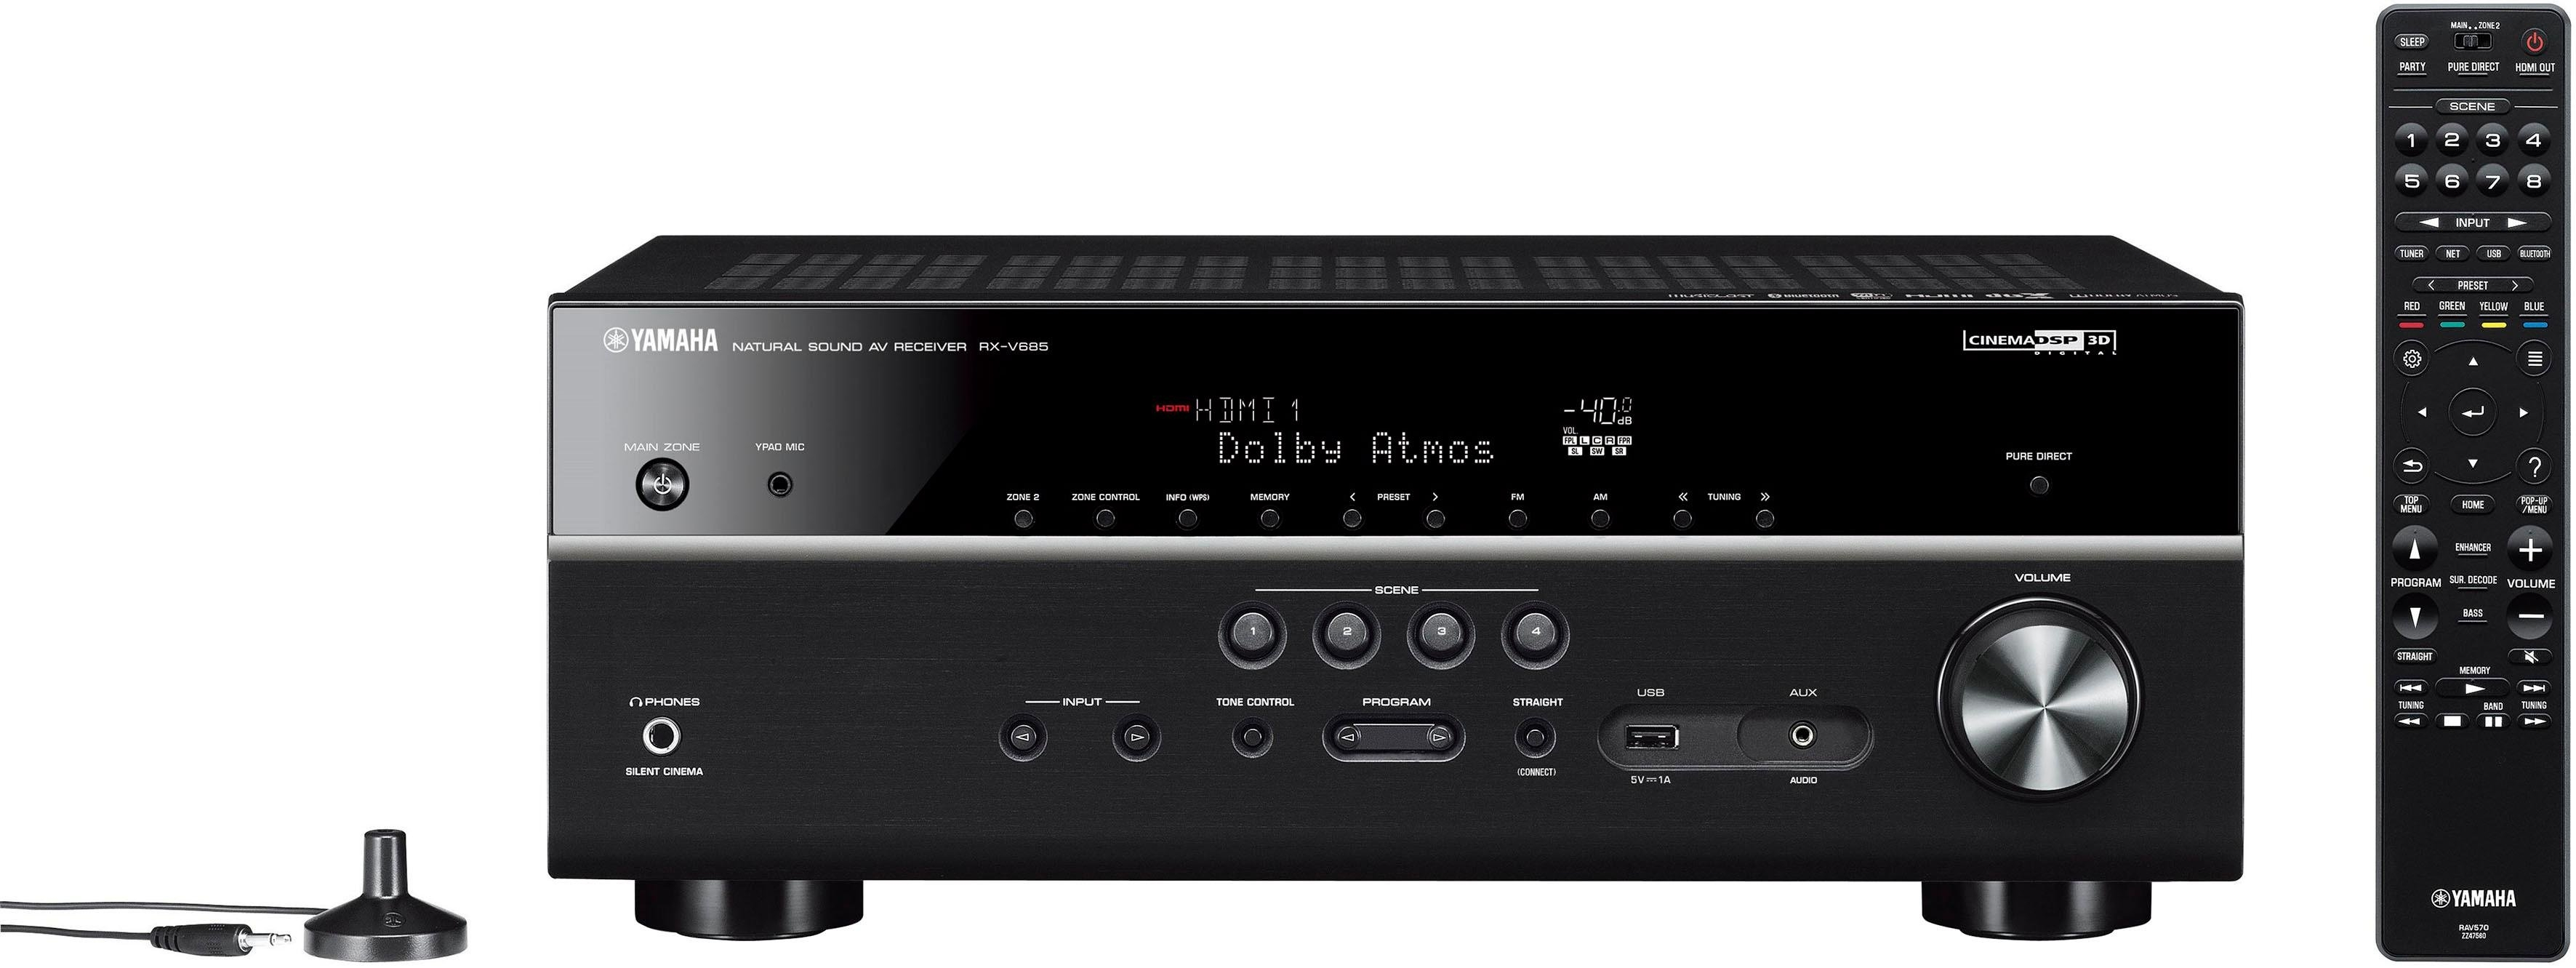 Yamaha »RX-V685« 7.2 AV-receiver (Bluetooth, wifi, LAN (ethernet), 4K-upscalingtechniek) in de webshop van OTTO kopen